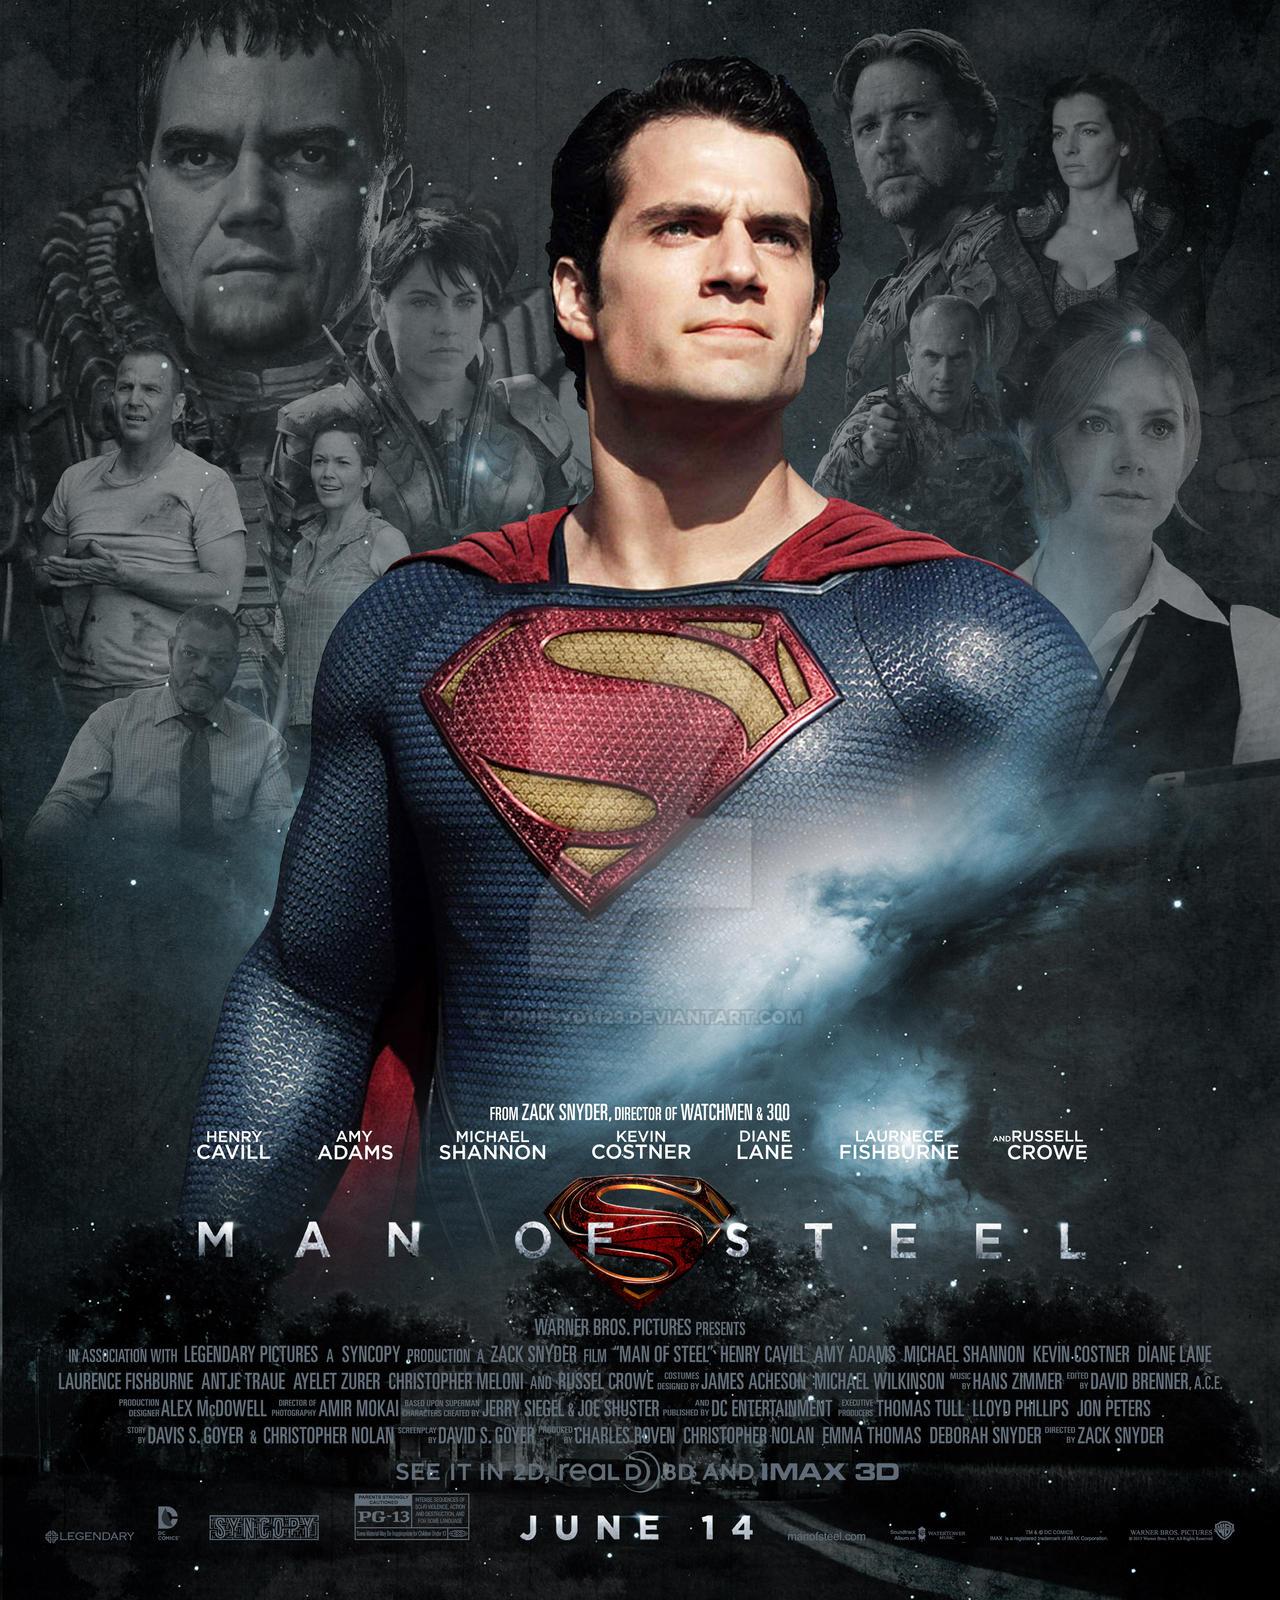 Man of Steel Poster 1 by jonesyd1129 on DeviantArt